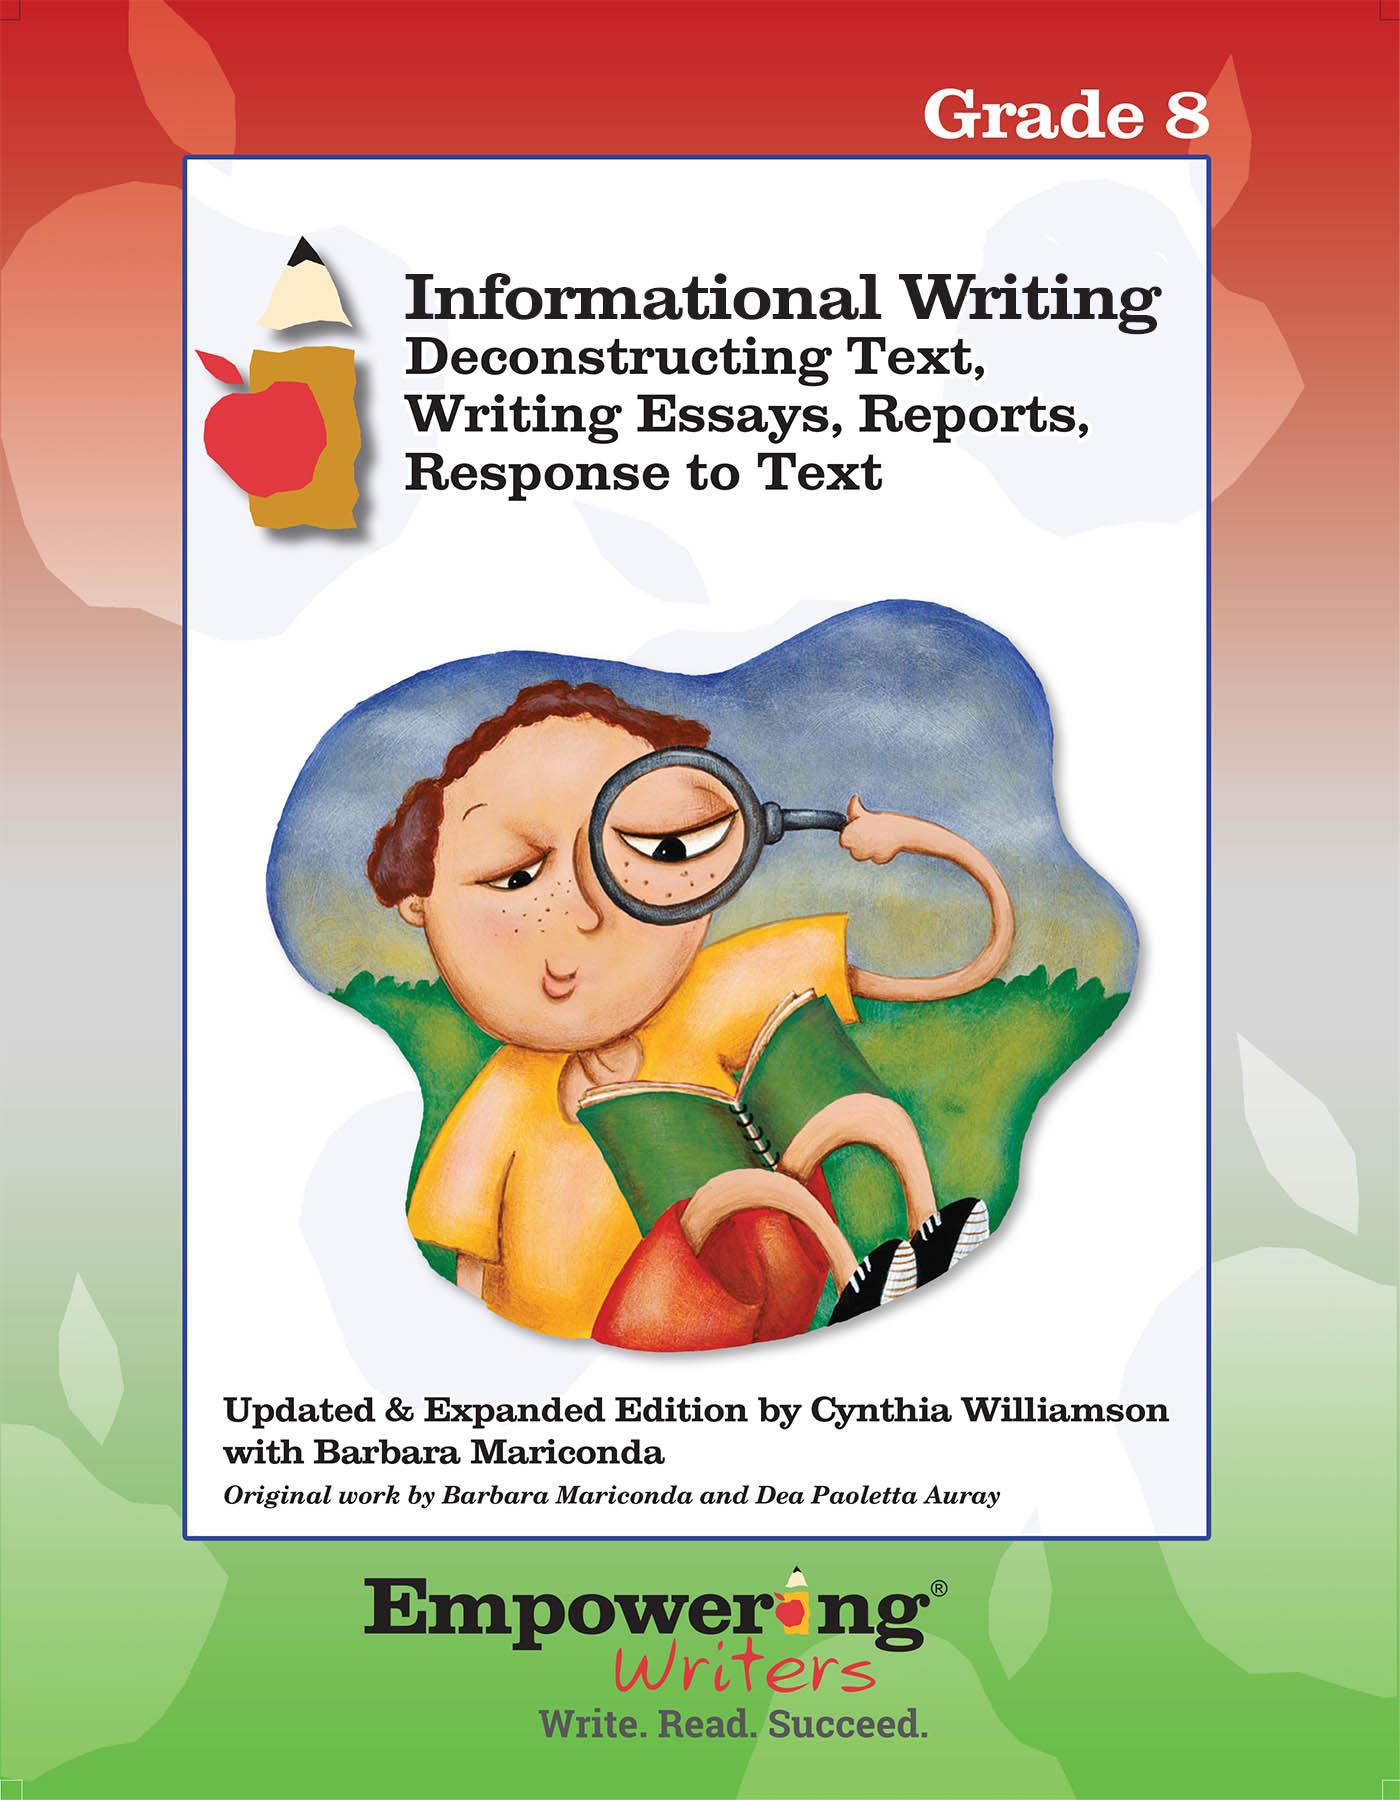 Grade 8 Informational Guide Covers New Logo 5.18.18-1 copy